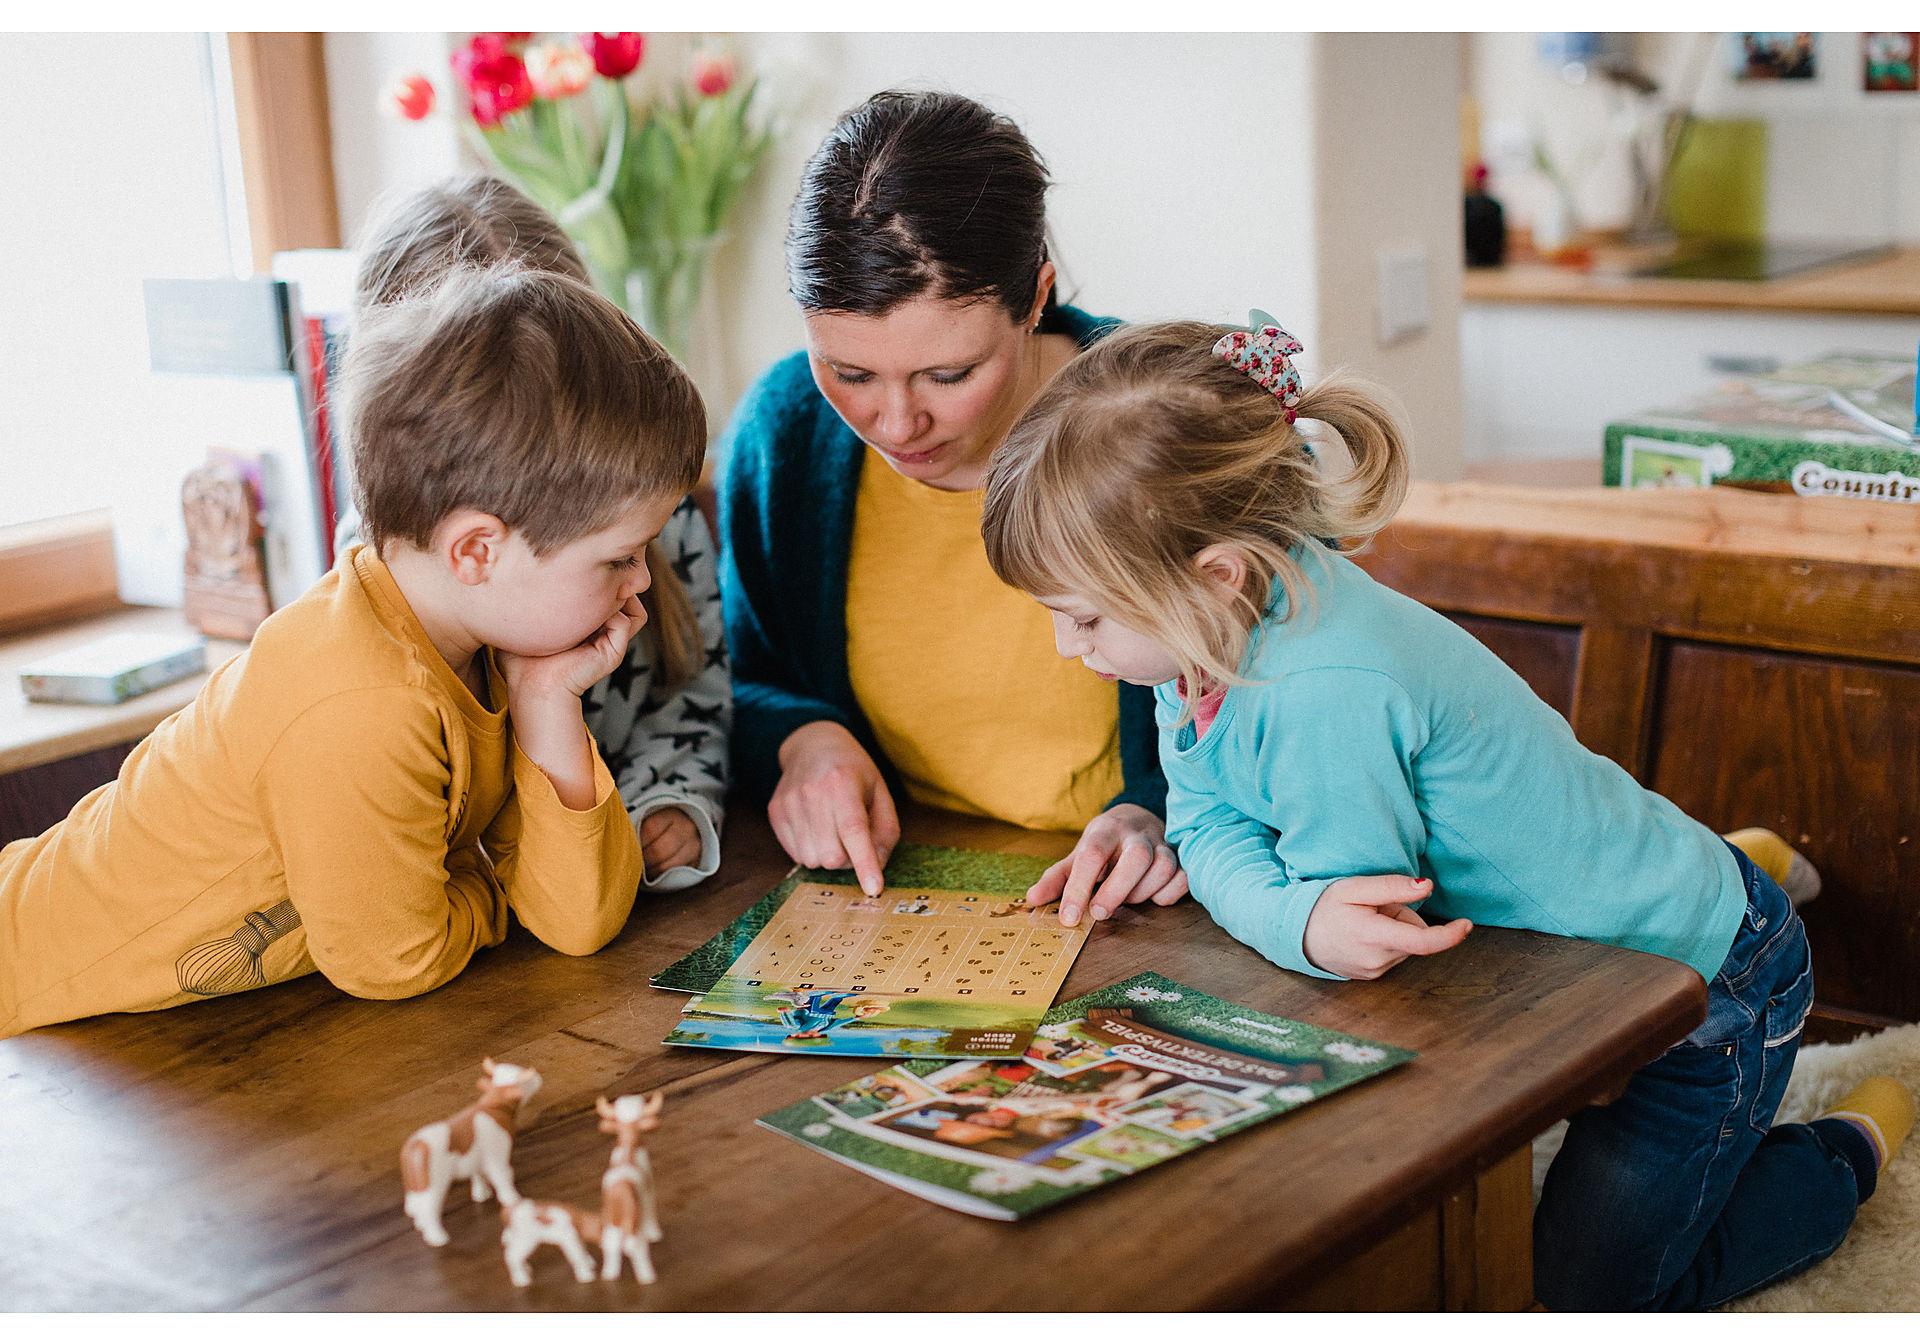 70763 PLAYMOBIL®Box: COUNTRY Das Detektivspiel Das Familienevent zoom image5